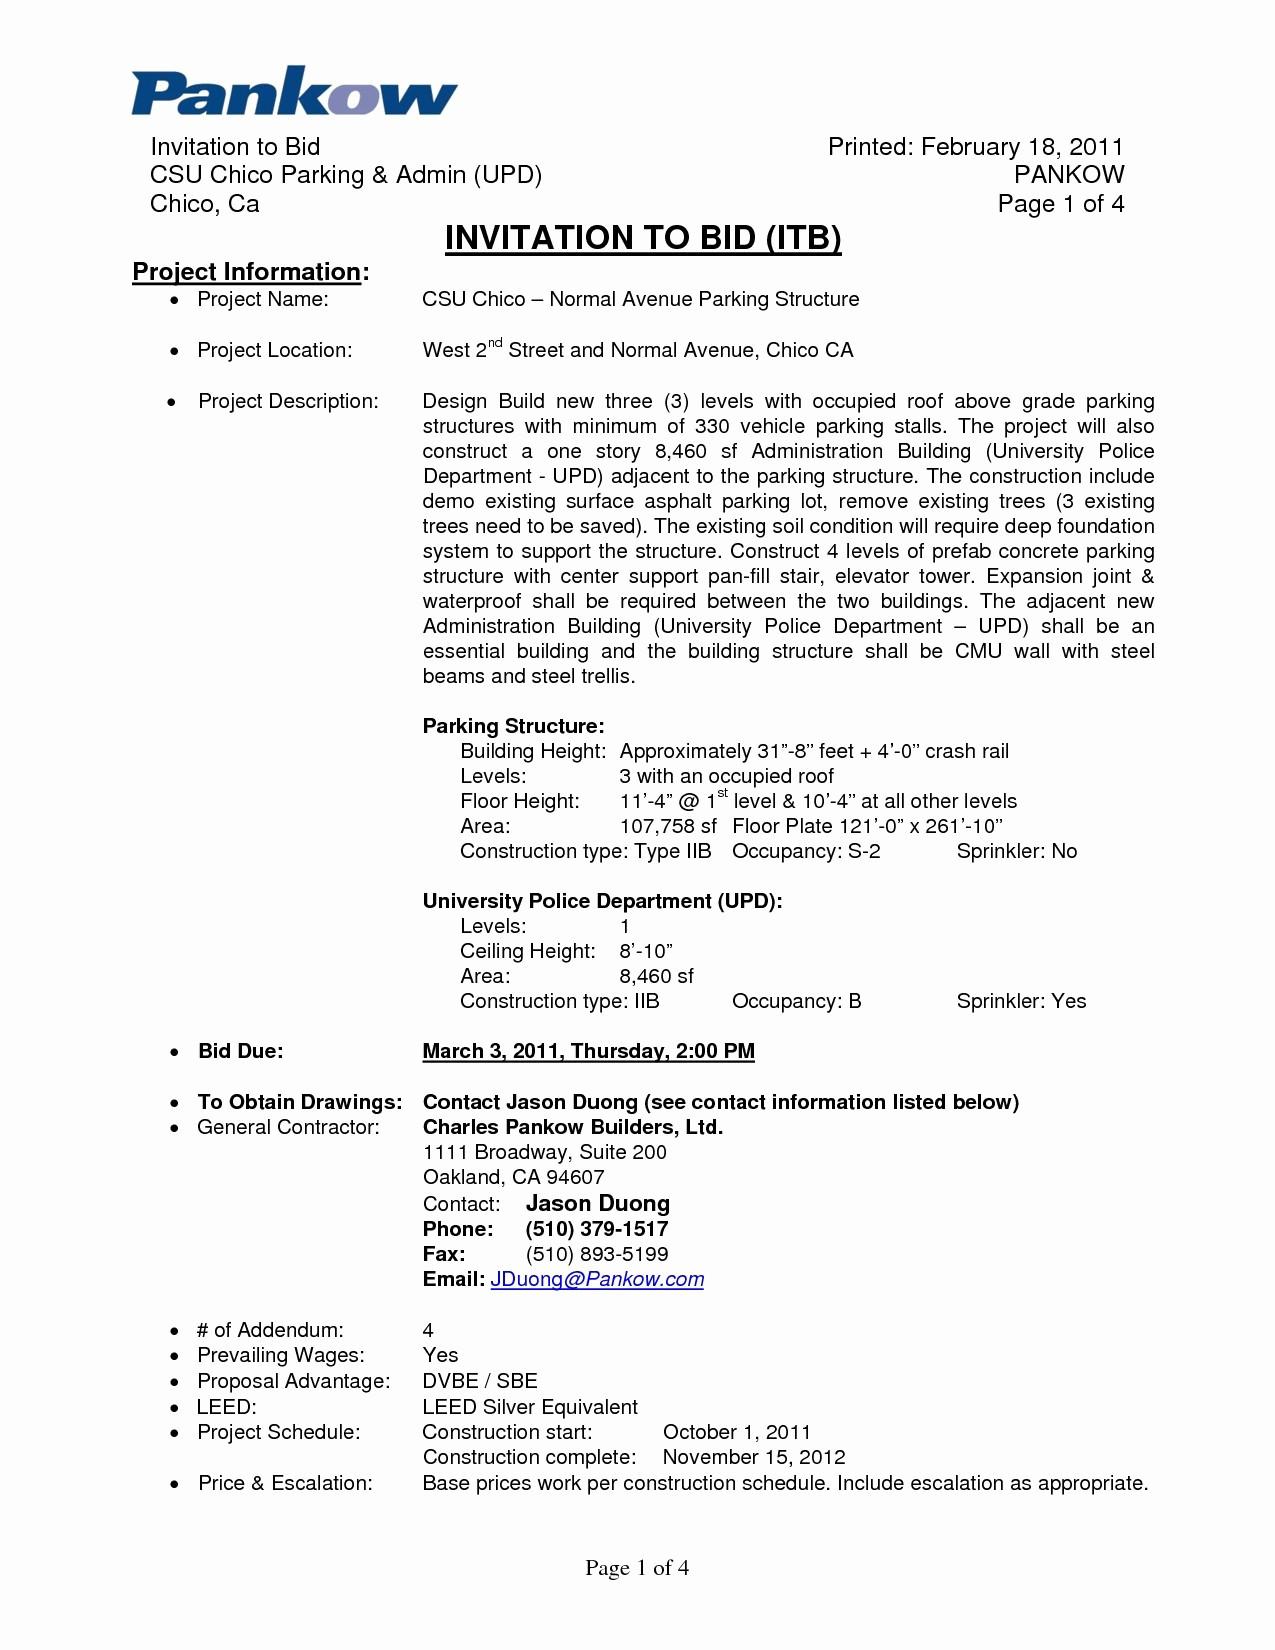 Invitation to Bid Template Construction Elegant Construction Invitation to Bid Template Gallery Template